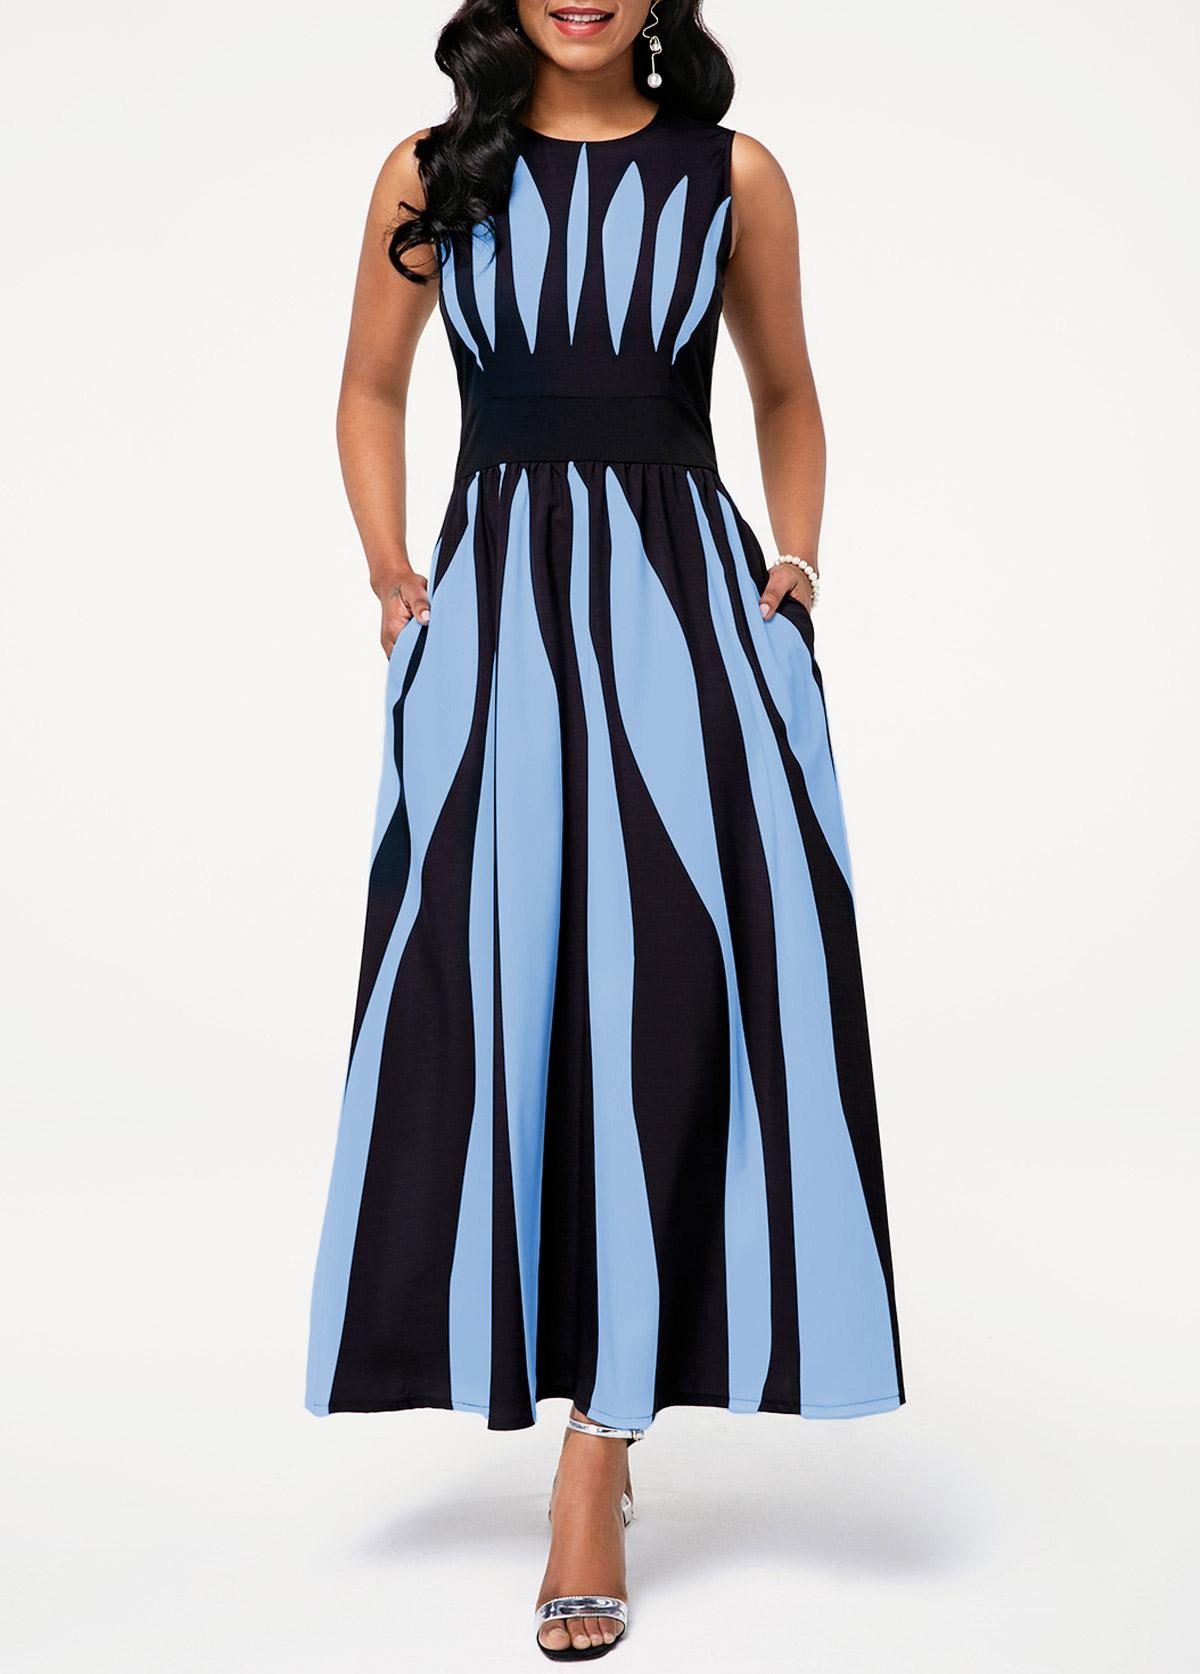 Stripe Print Round Neck Sleeveless Pocket Dress